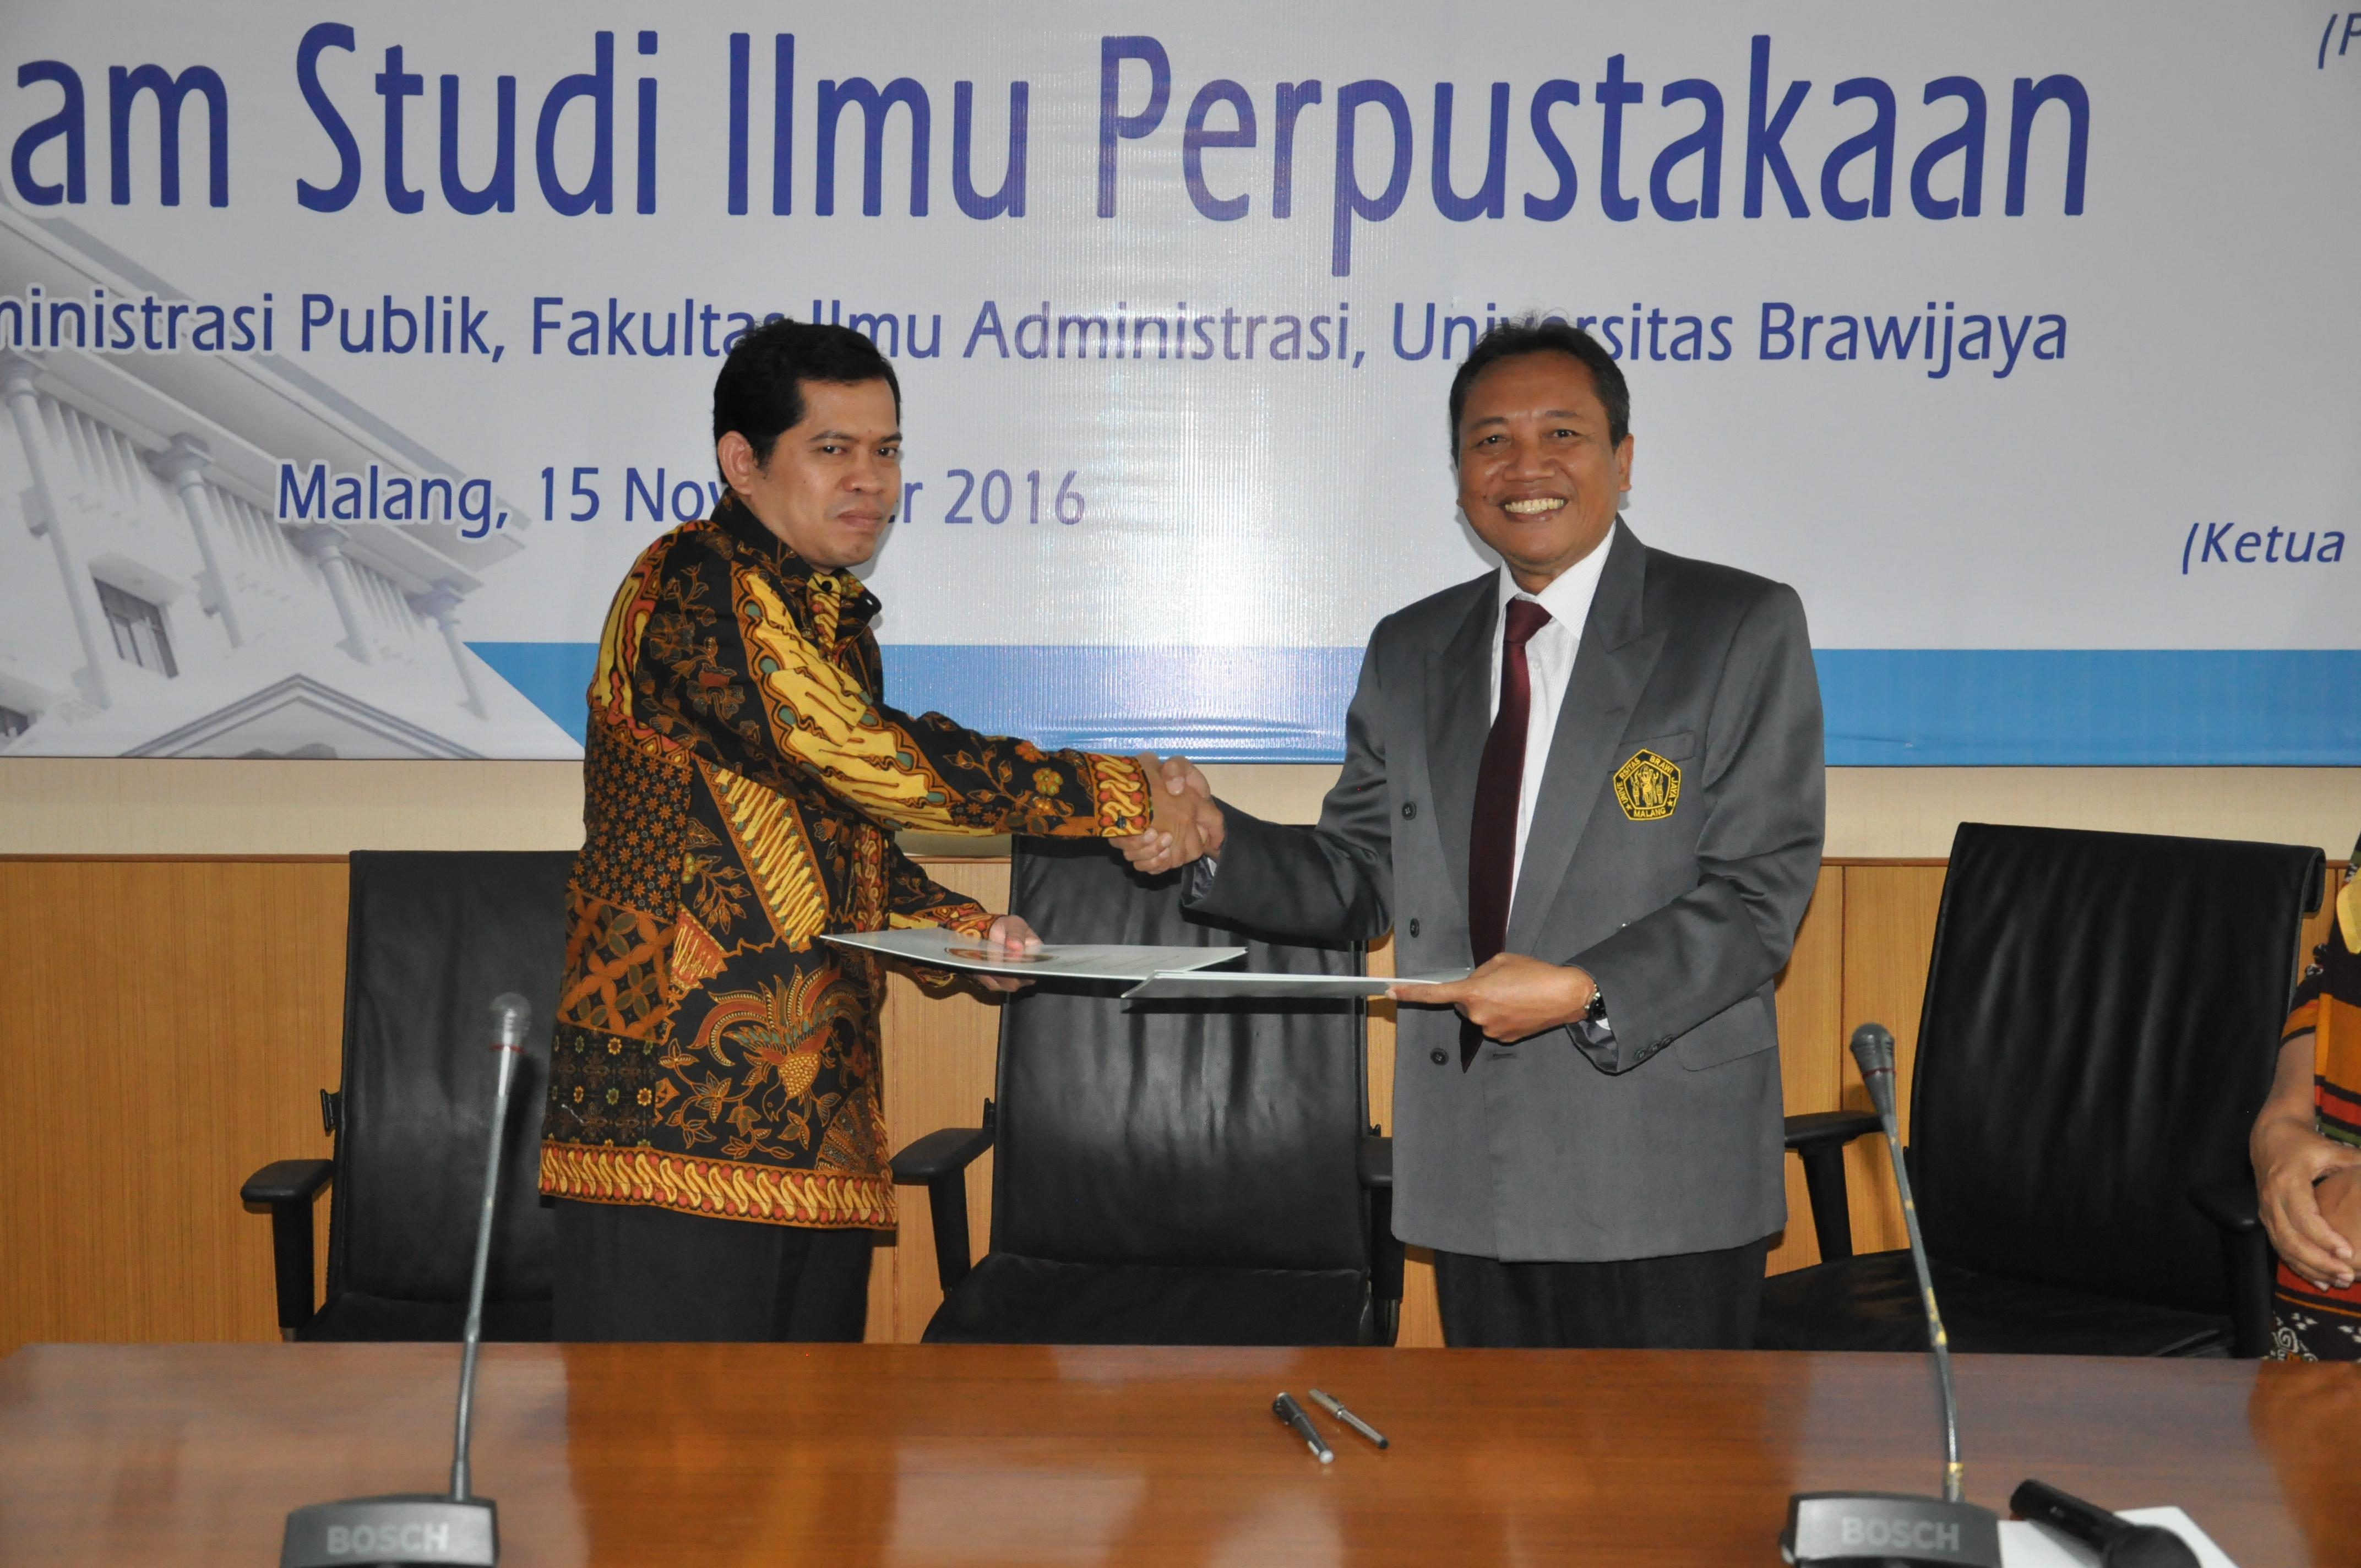 Dekan FIA UB Prof. Dr. Bambang Supriyono, MS Usai Menandatangani Nota Kesepahaman Dengan Farli Elnumeri, Ketua Umum Ikatan Sarjana Ilmu Perpustakaan Dan Informasi